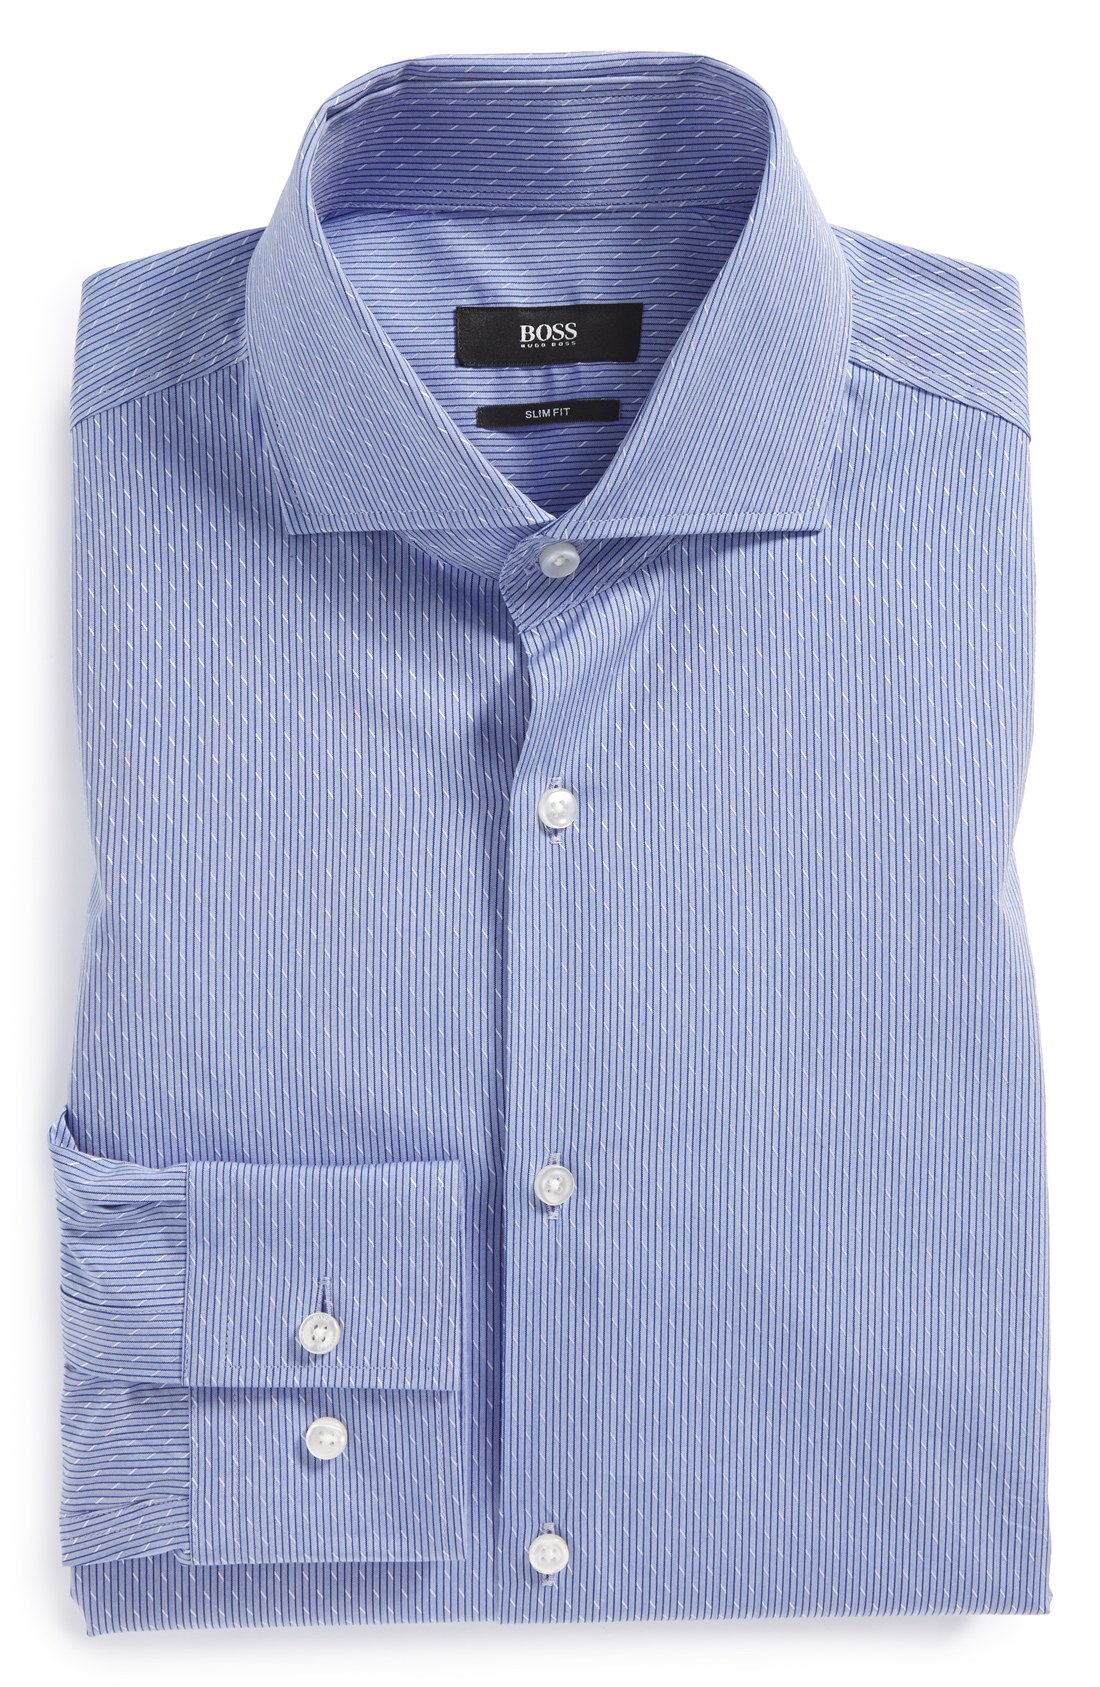 Boss 39 jason 39 ww slim fit dress shirt shop it to me all for Hugo boss jason shirt